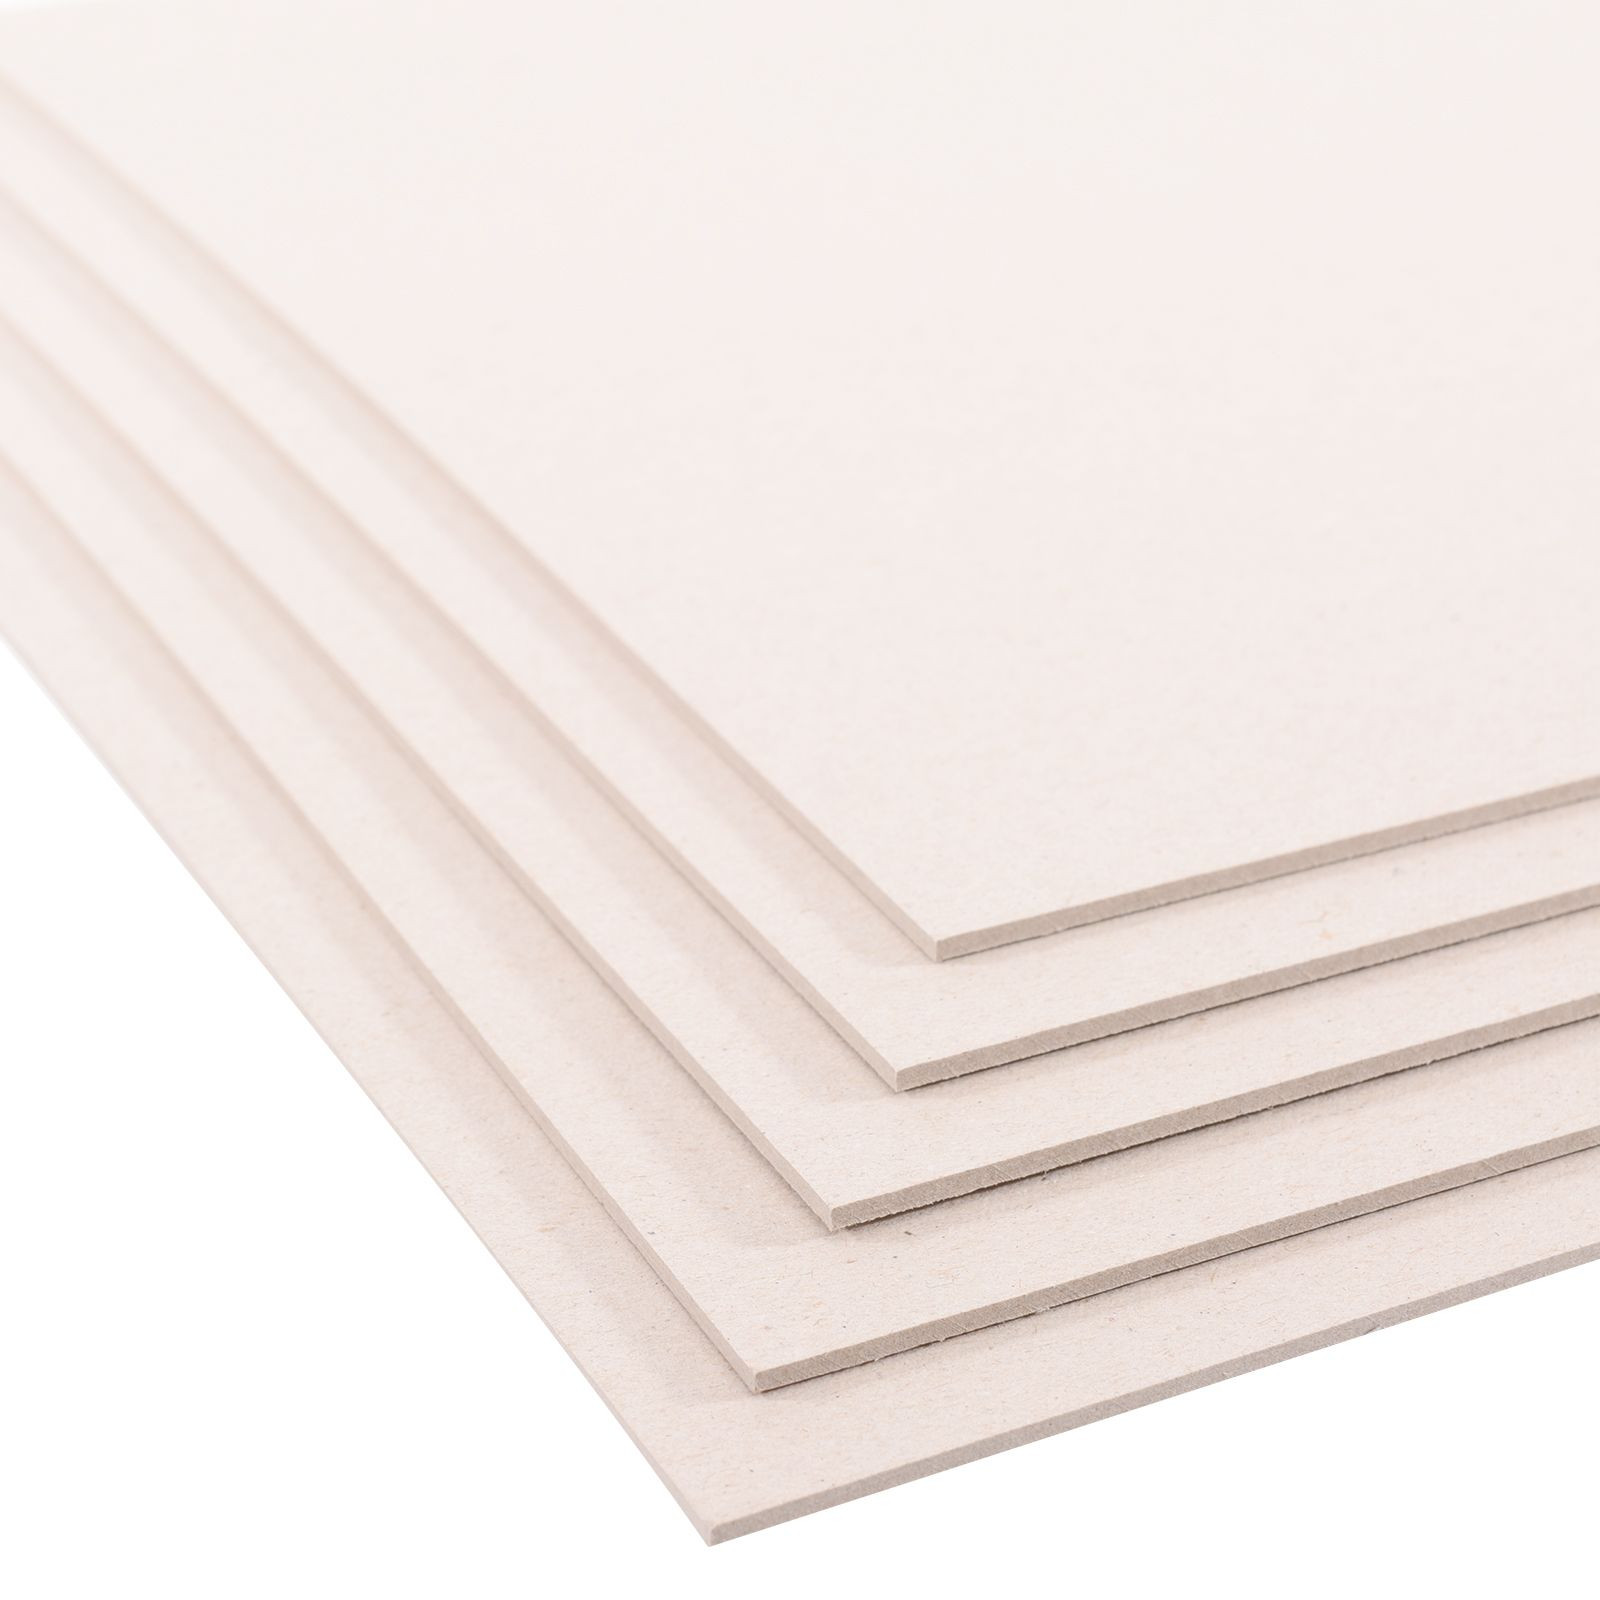 Vaessen Creative - Greyboard 30,5x30,5cm 2mm 5pcs